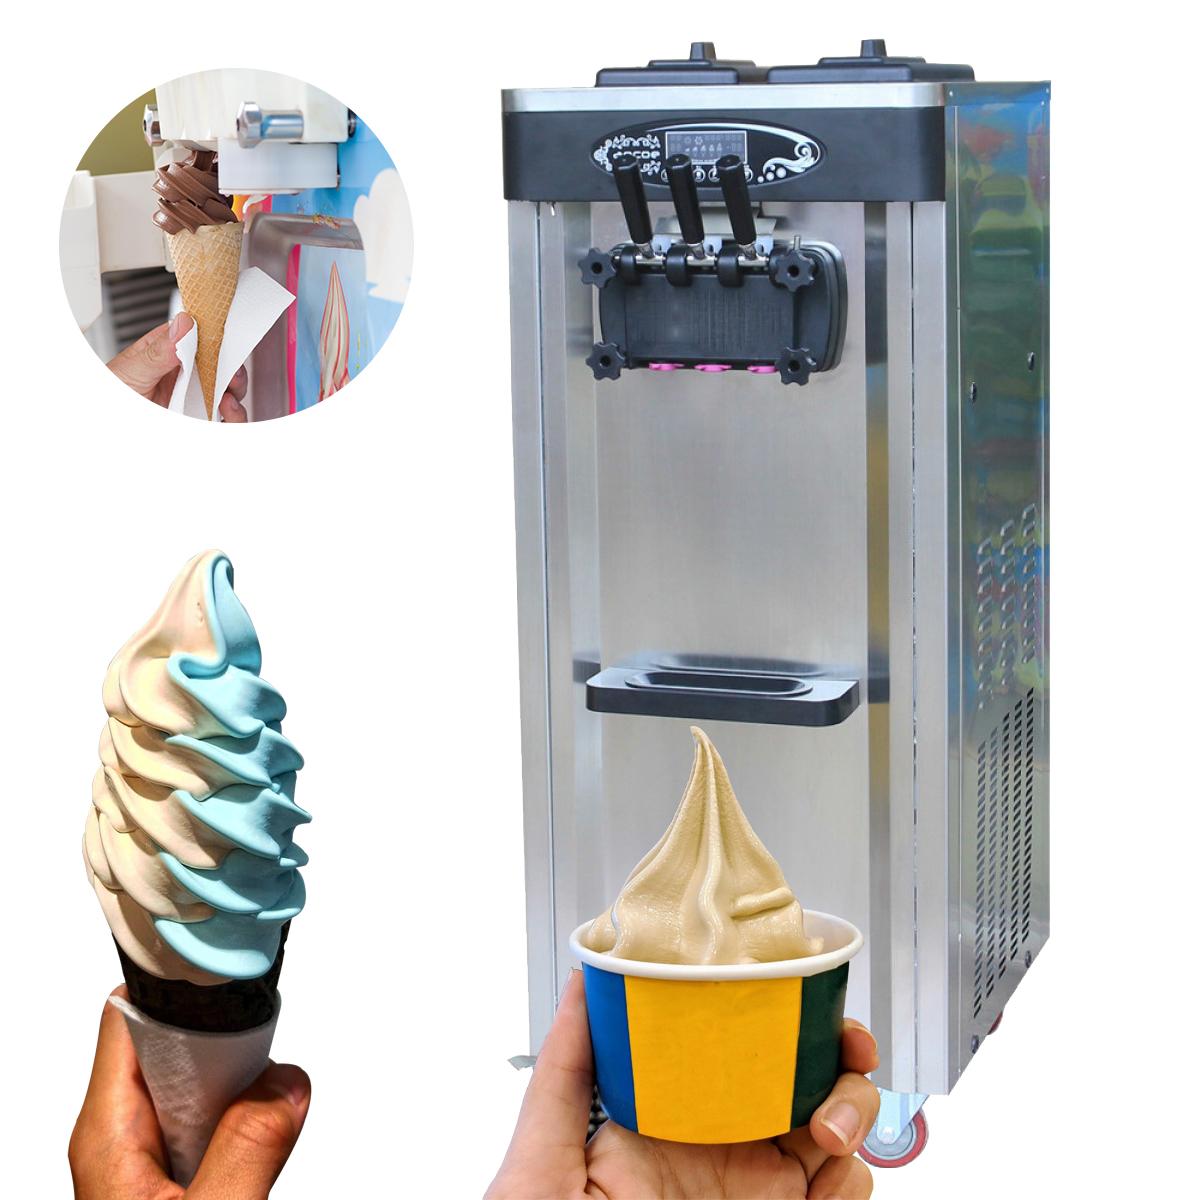 Soft Ice Cream Machines Market is in huge demand : Electro Freeze, Carpigiani, Taylor, Stoelting, Donper